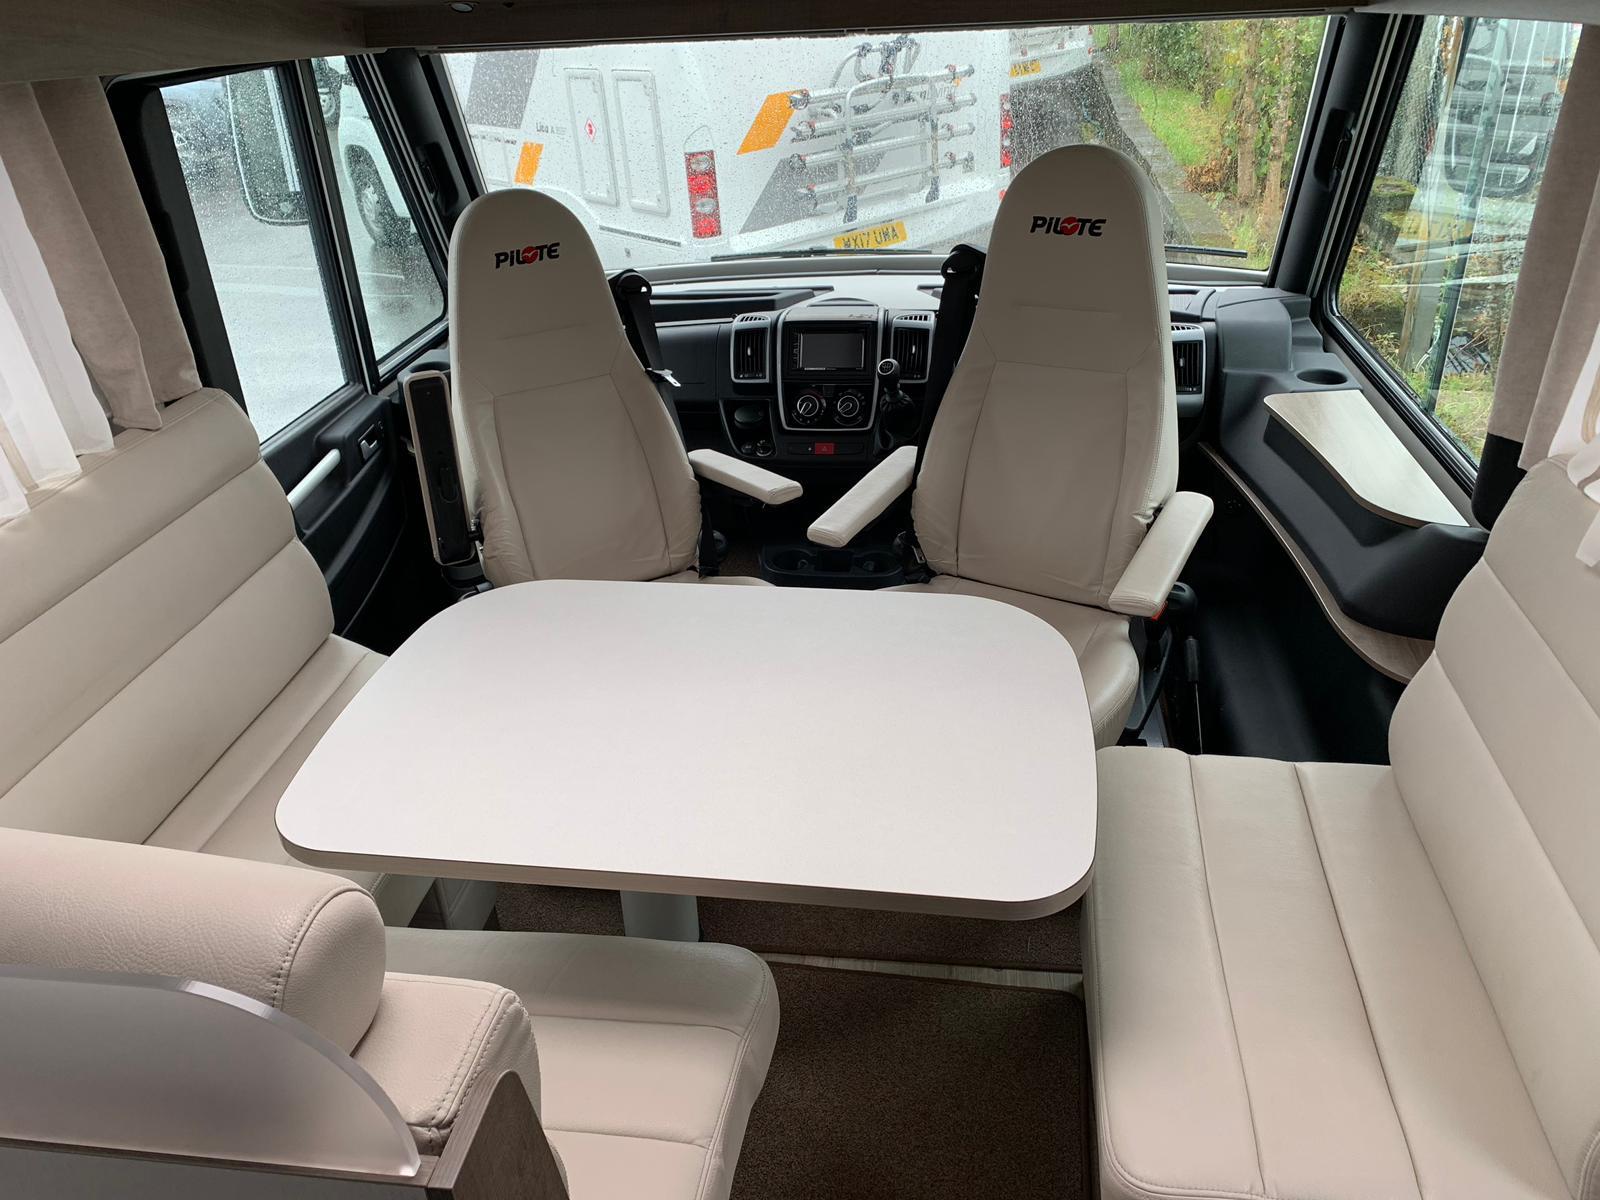 Pilote - Sensation 740G - 4 Berth Luxury Motorhome For Hire in Bristol-Somerset